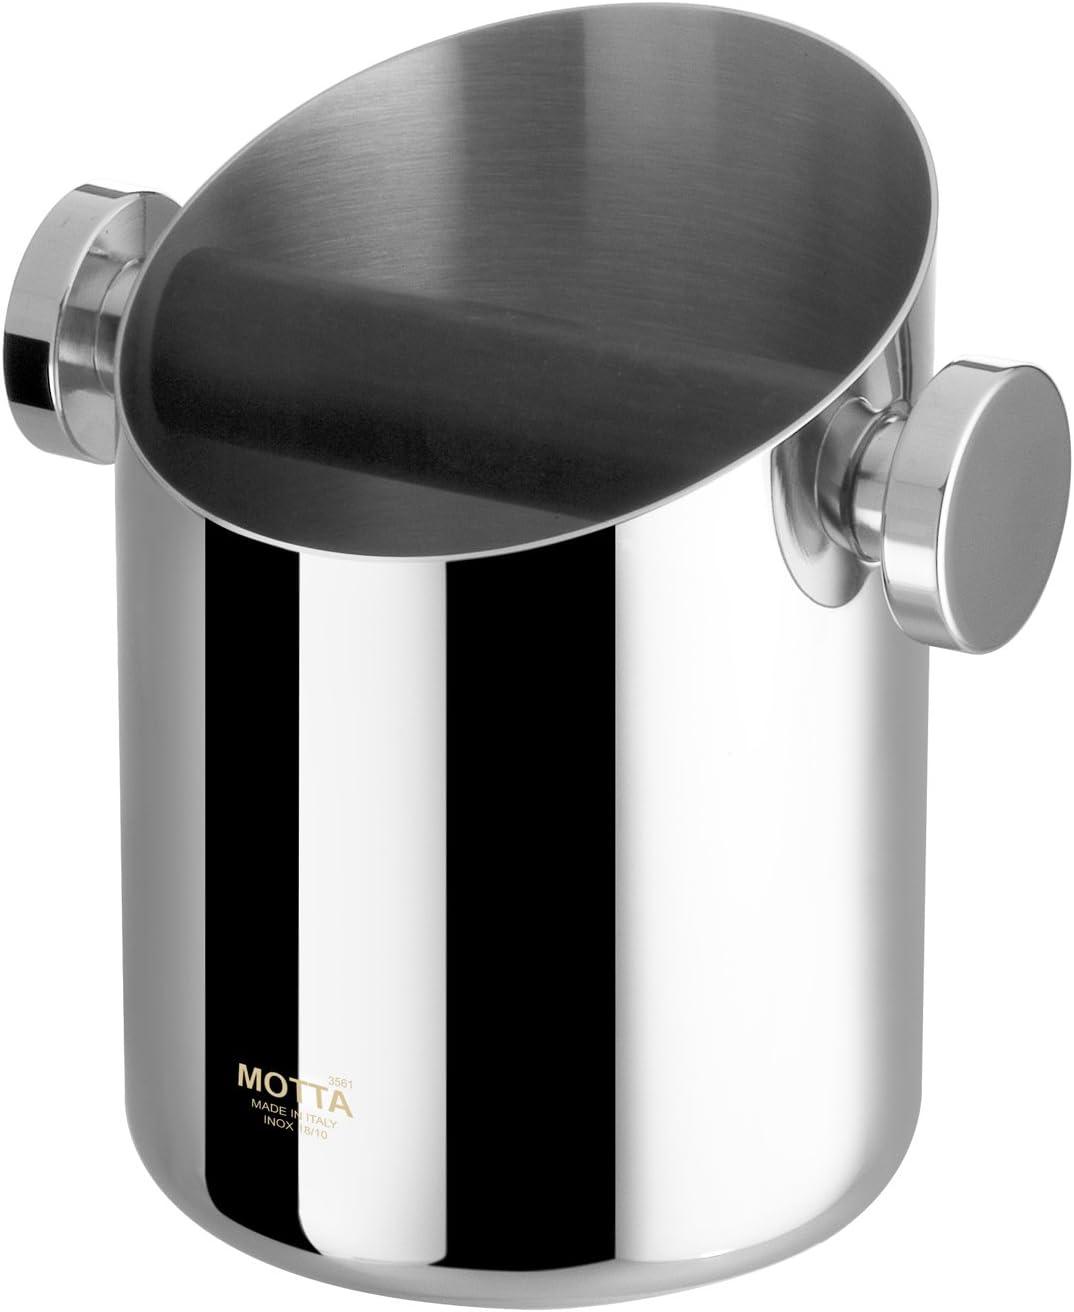 Motta stainless steel Knock Box - 11 diameter cm Limited Oakland Mall time sale